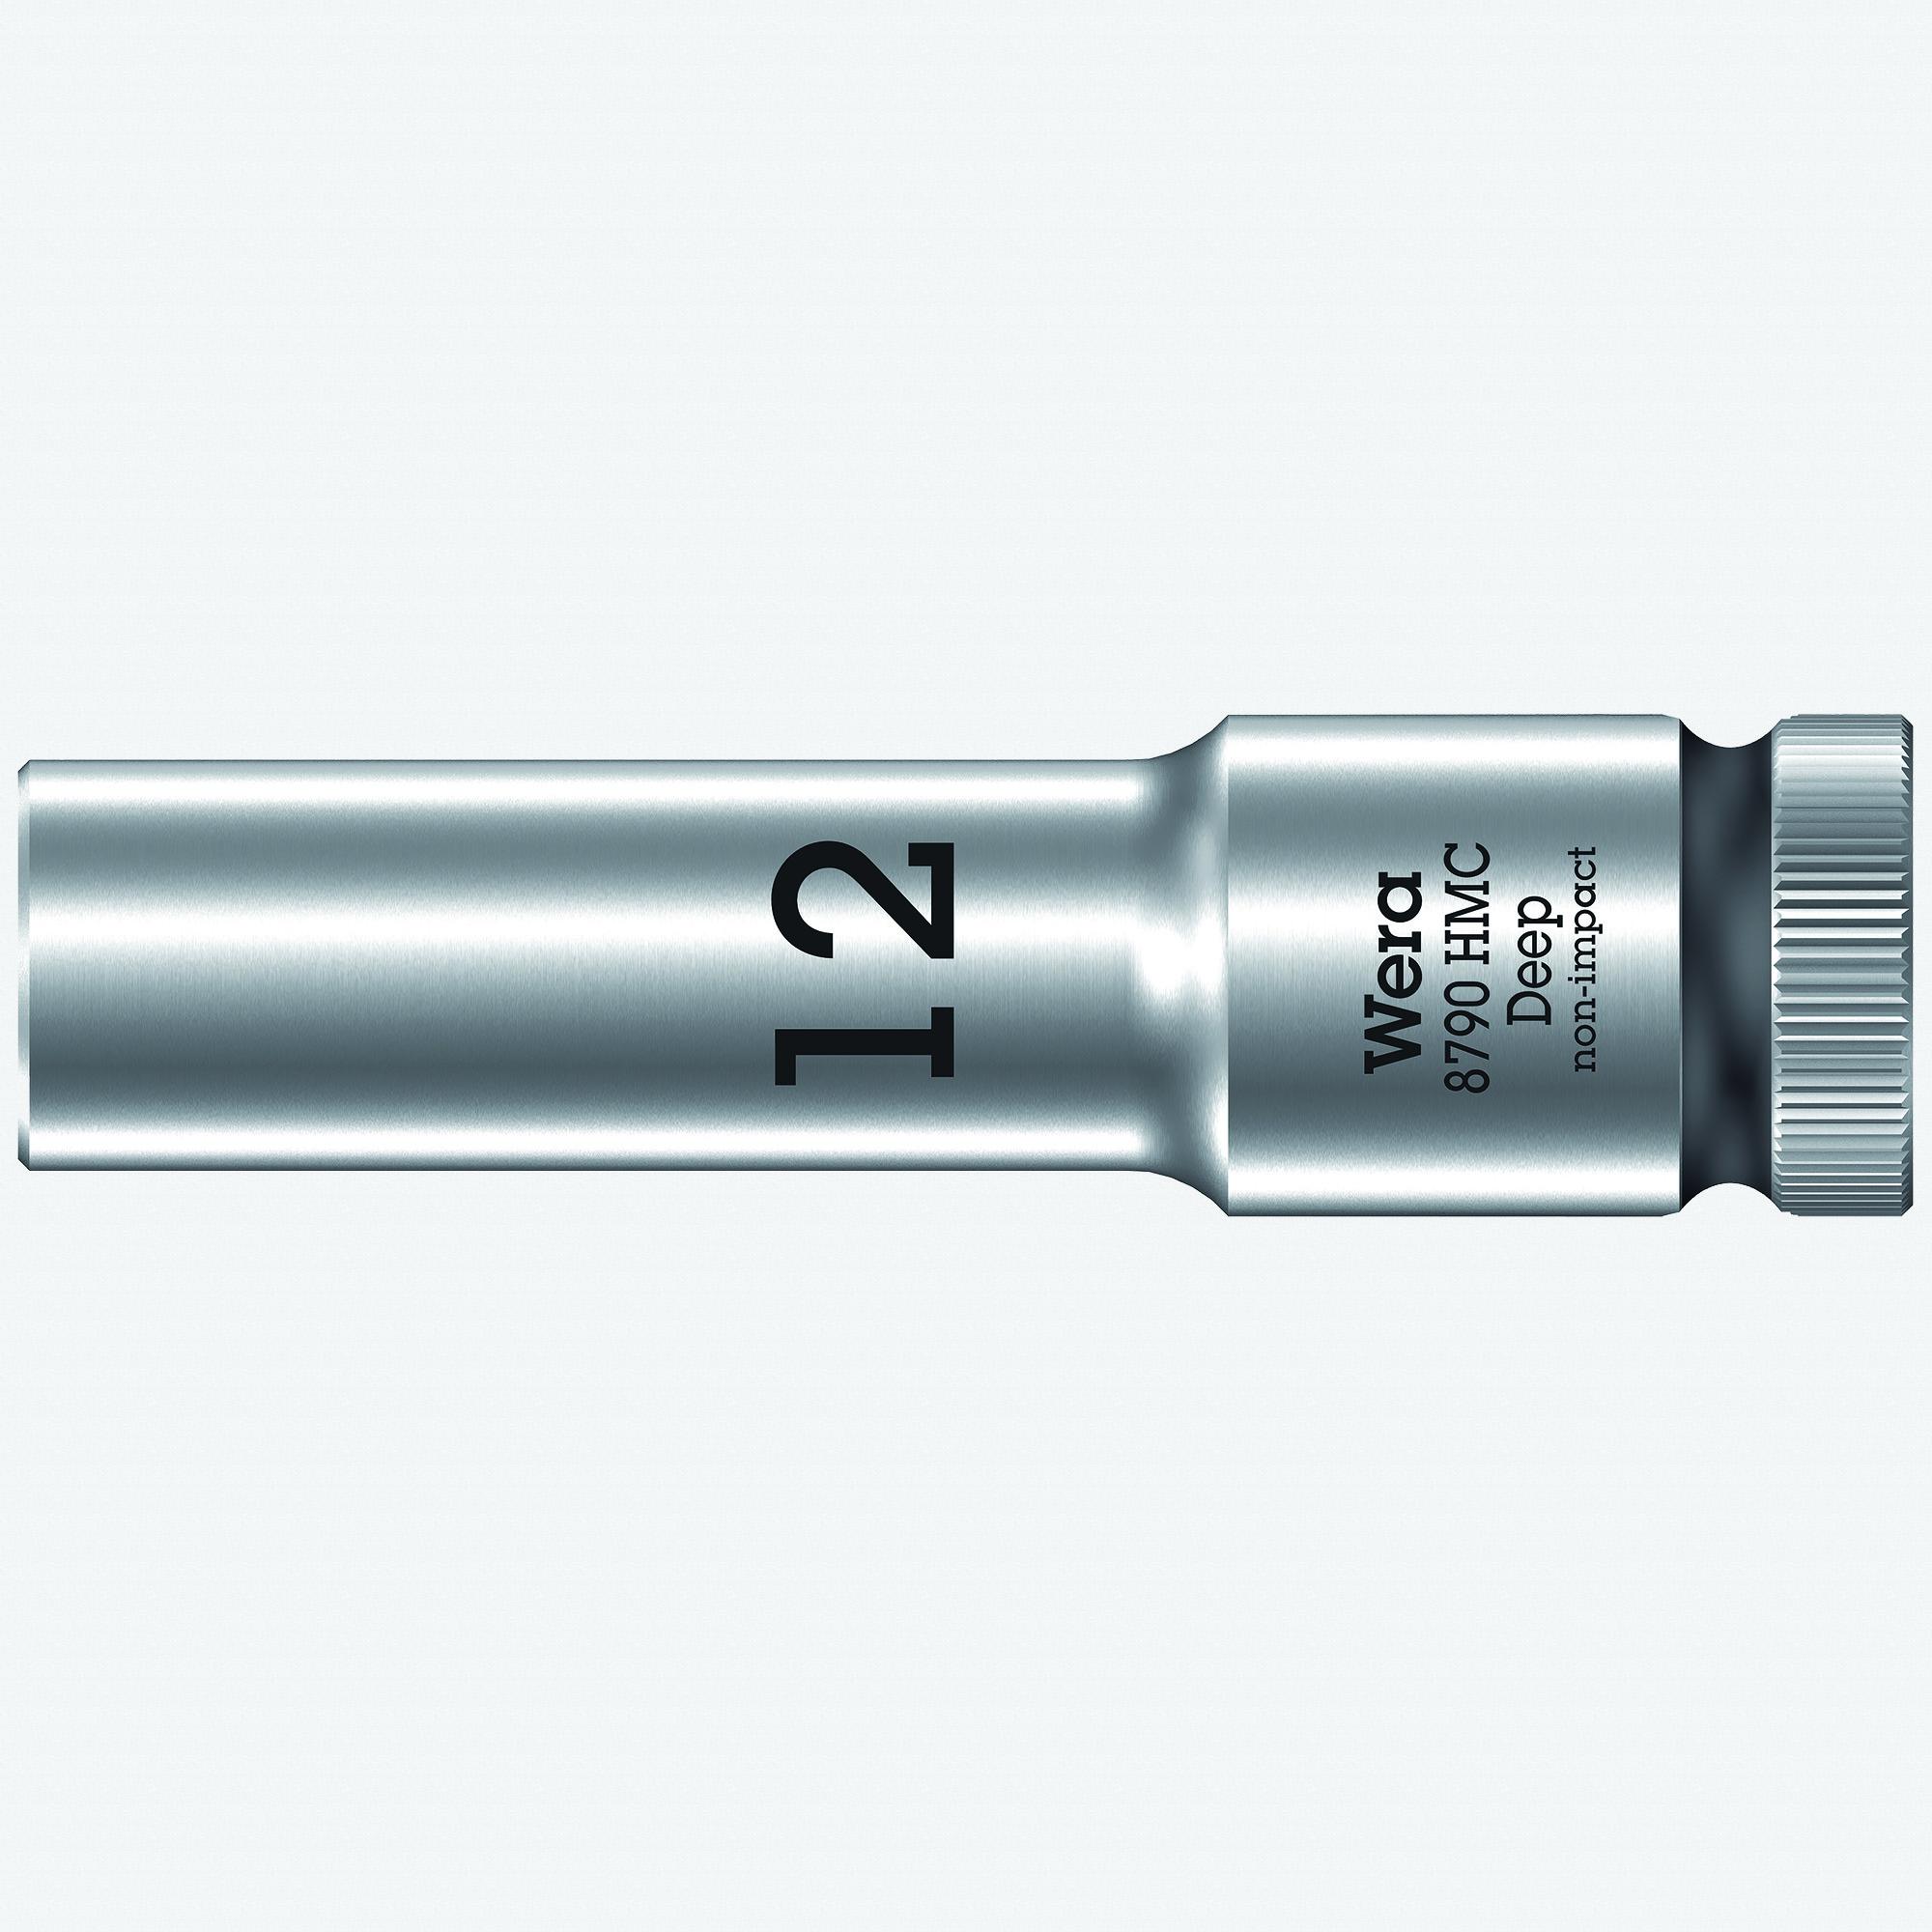 "Wera 004552 Deep Socket, 12 x 1/2"" - KC Tool"